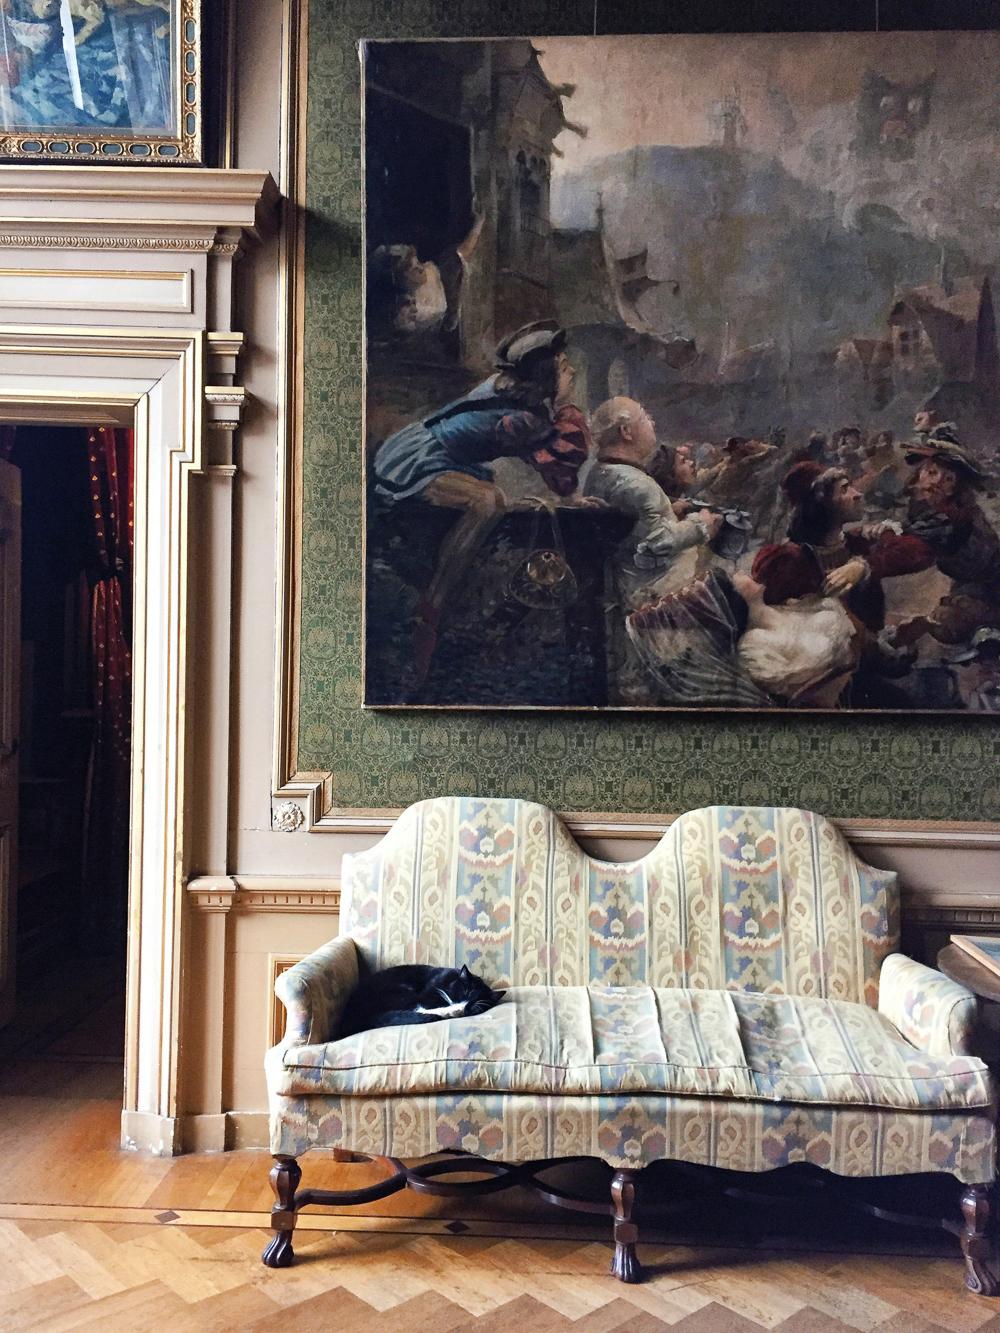 KattenKabinet Cat Museum, Amsterdam, Netherlands